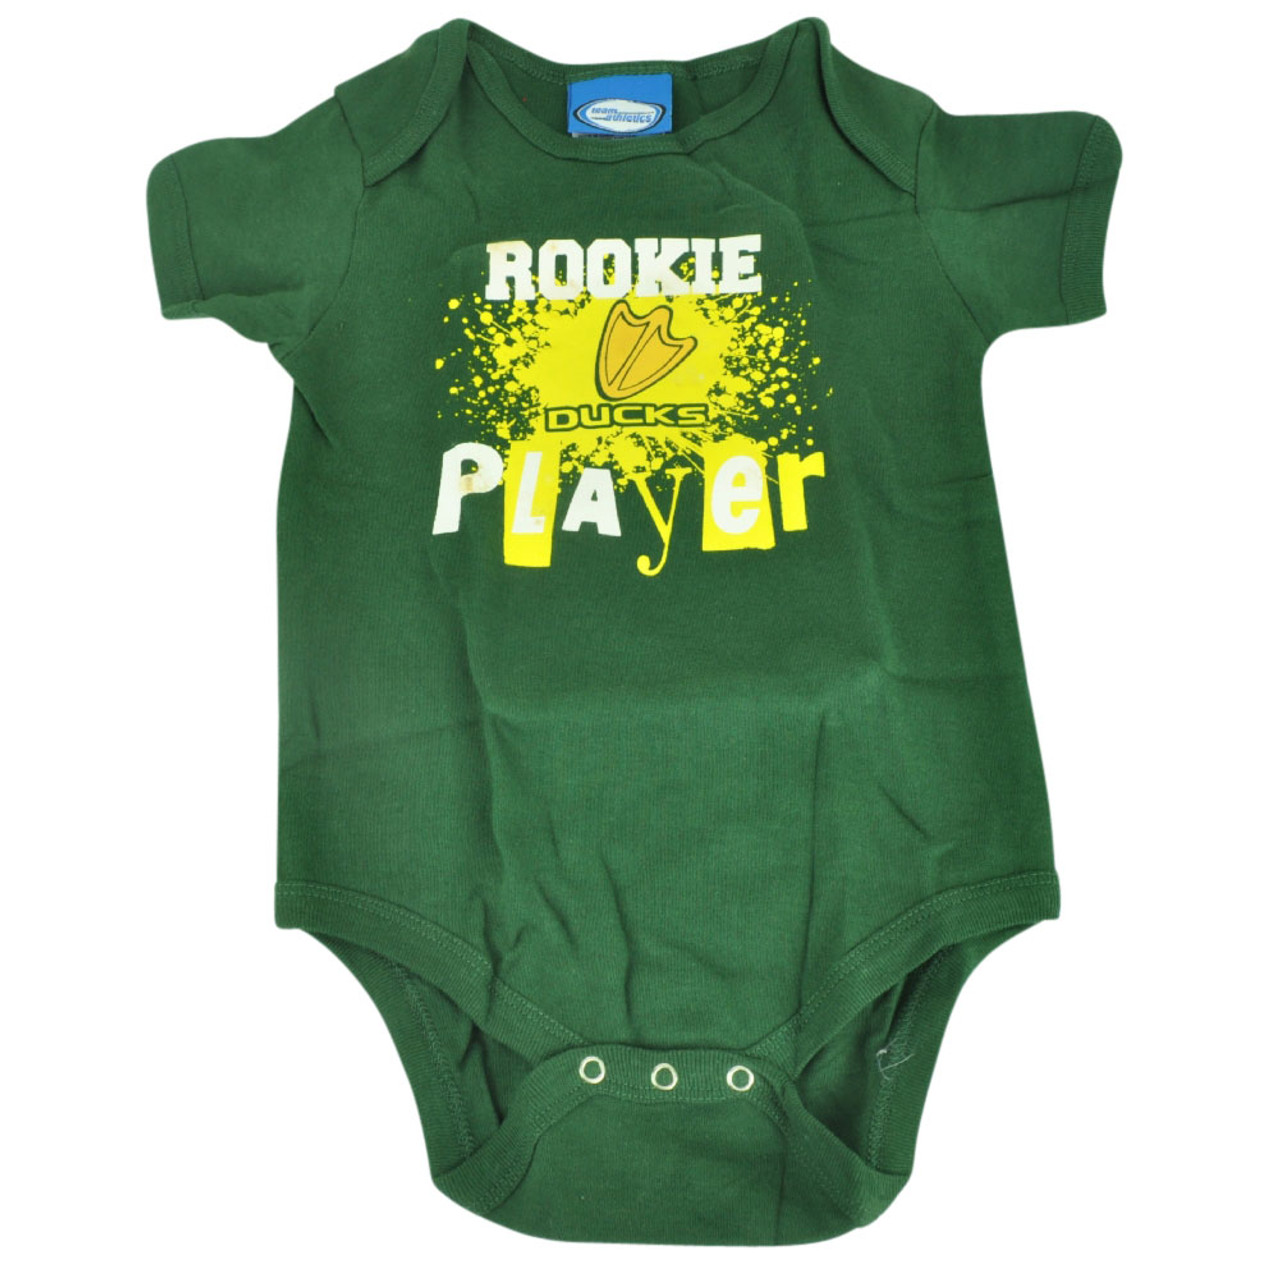 the best attitude 1a18f dc201 NCAA Oregon Ducks Wild Horse Rookie Player Infant Bodysuit Creeper Green